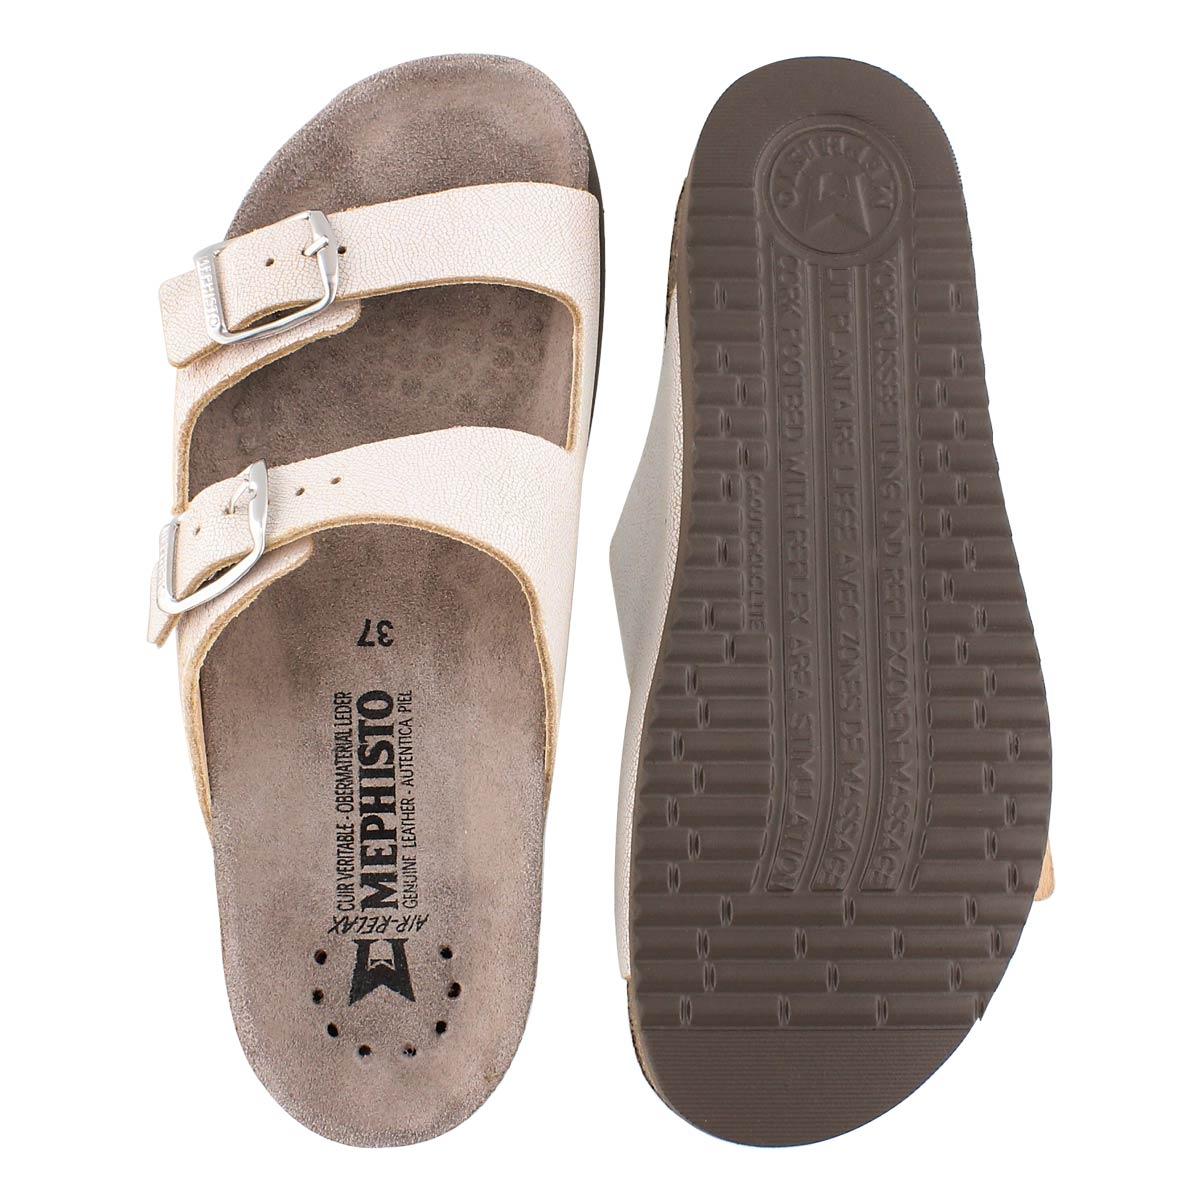 Lds Harmony venise cork footbed slide